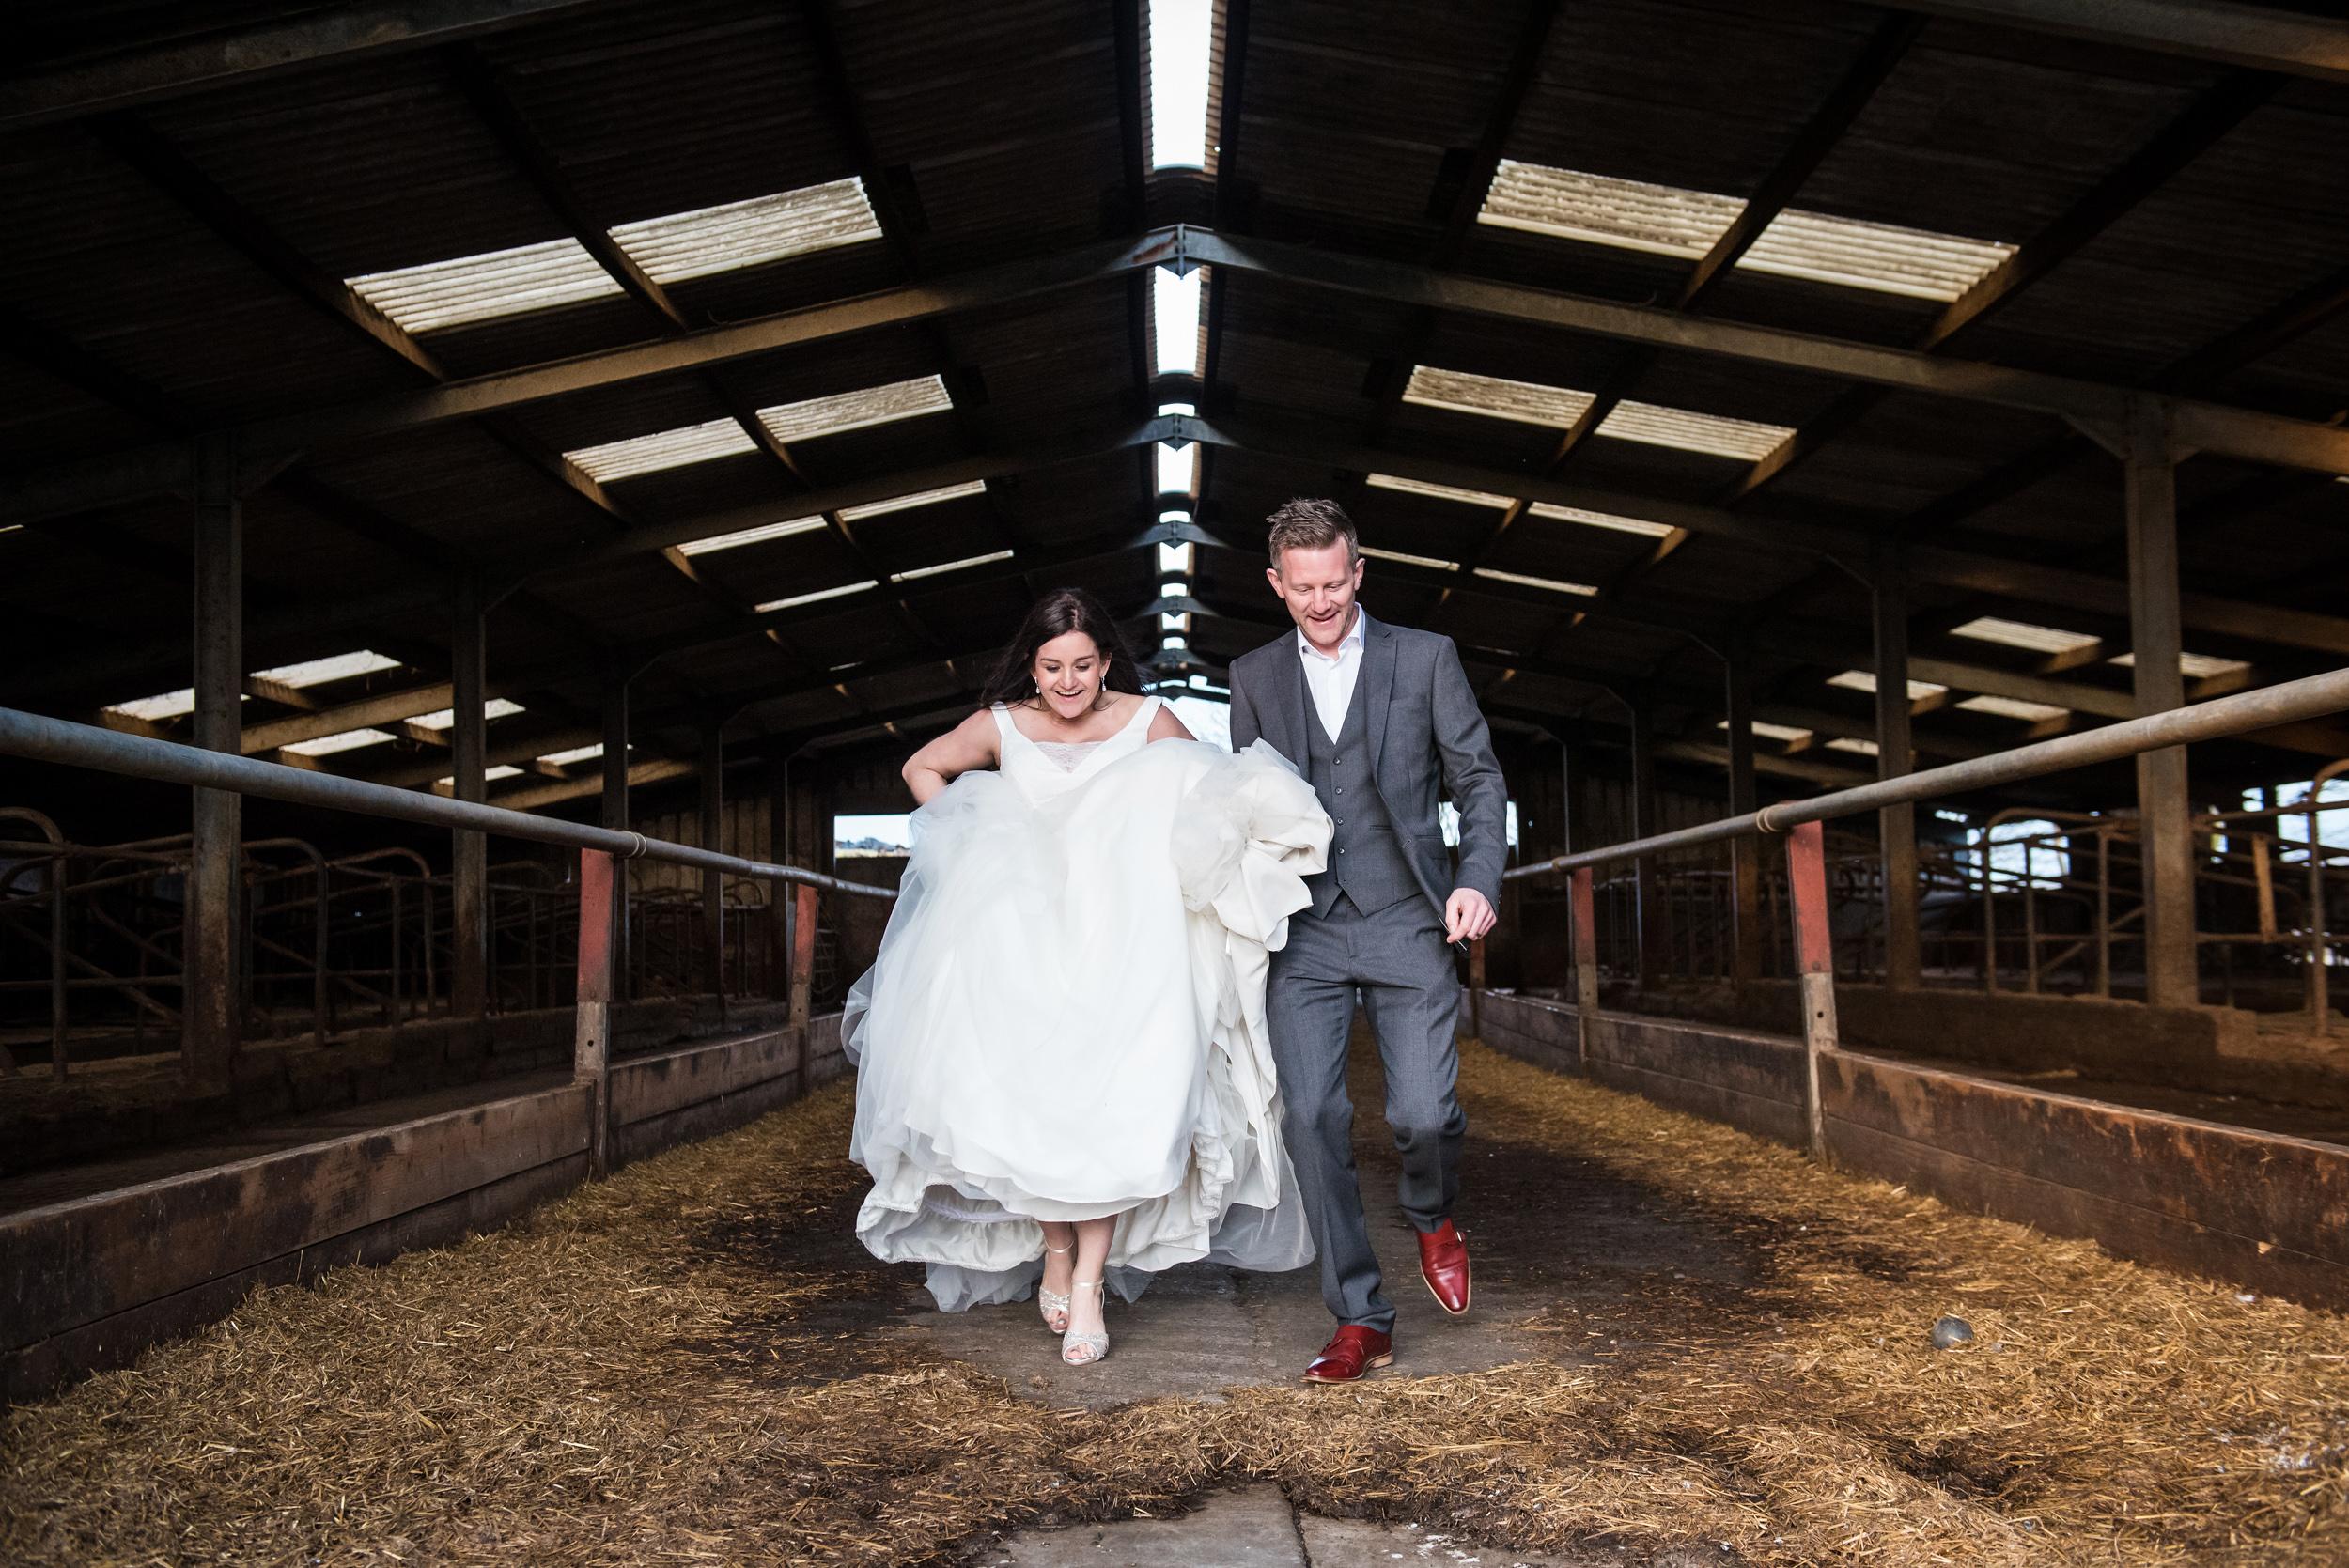 David Scholes Lancashire wedding photography 2016-40.jpg